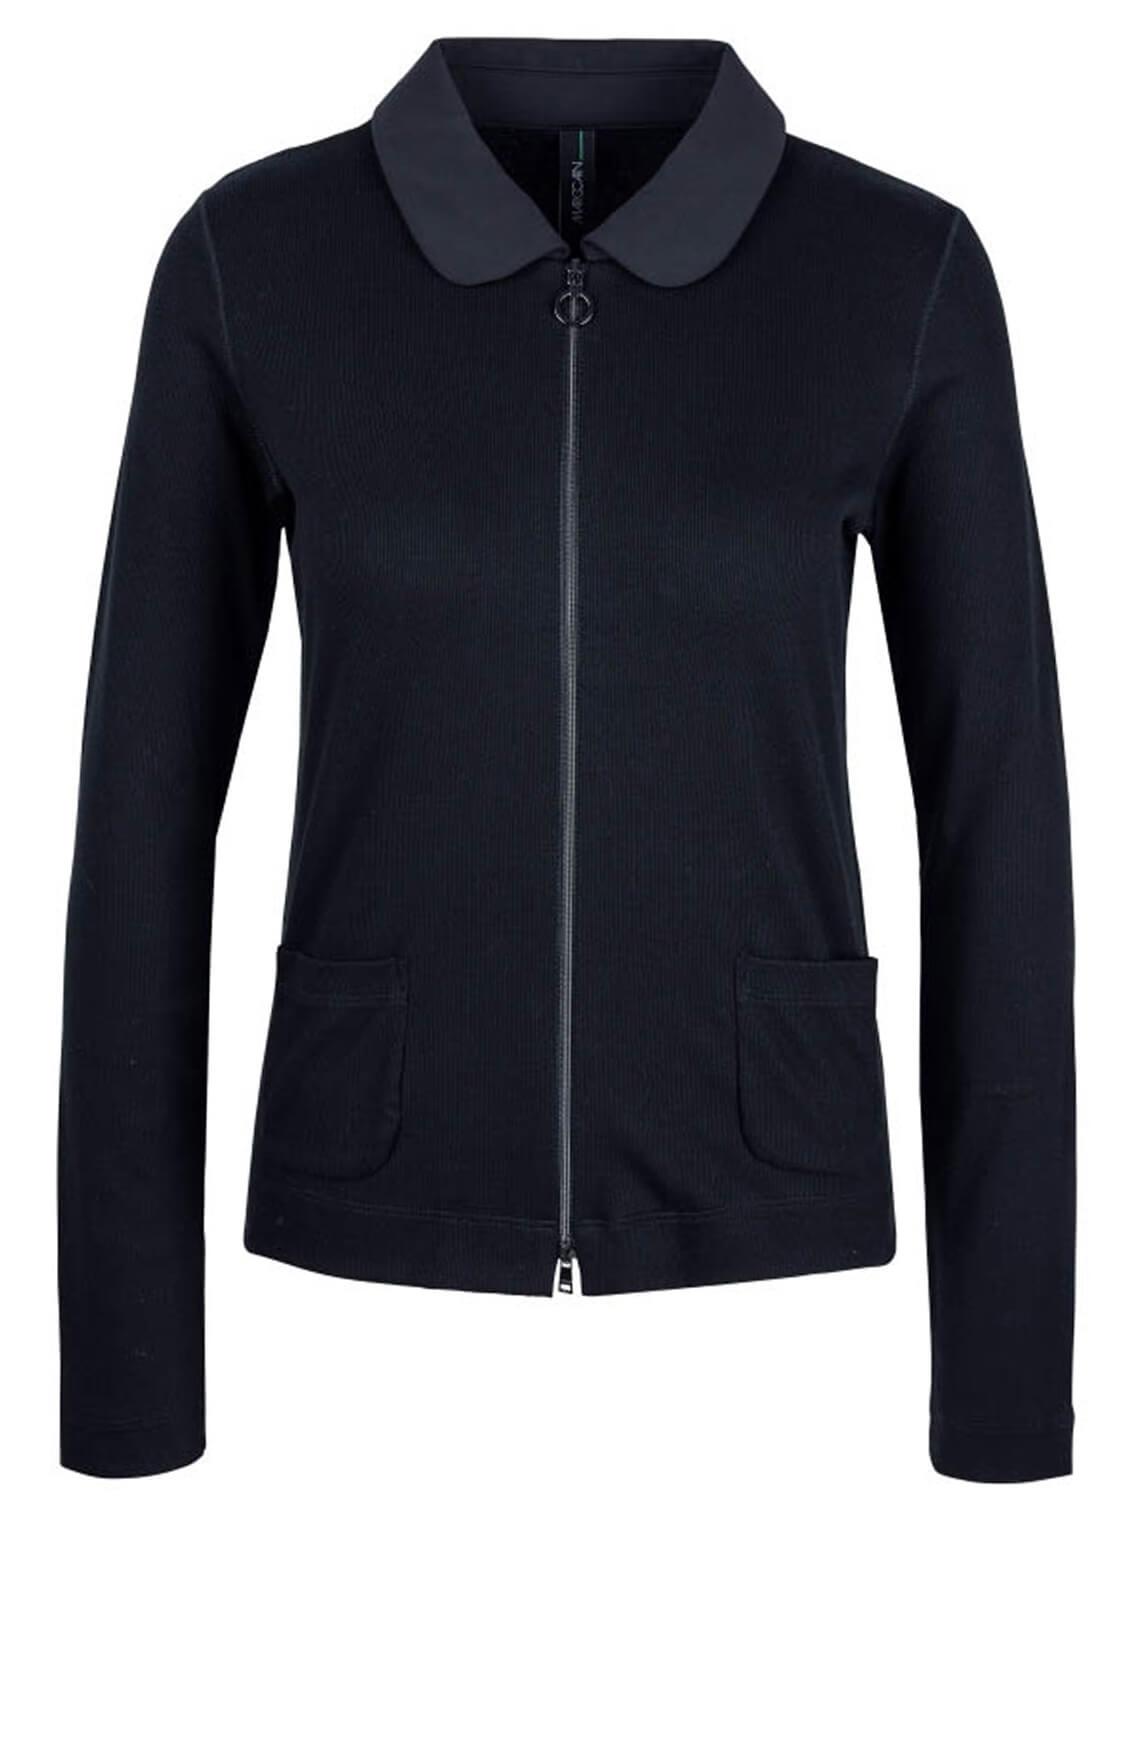 Marccain Sports Dames Vest in ribdesign Blauw